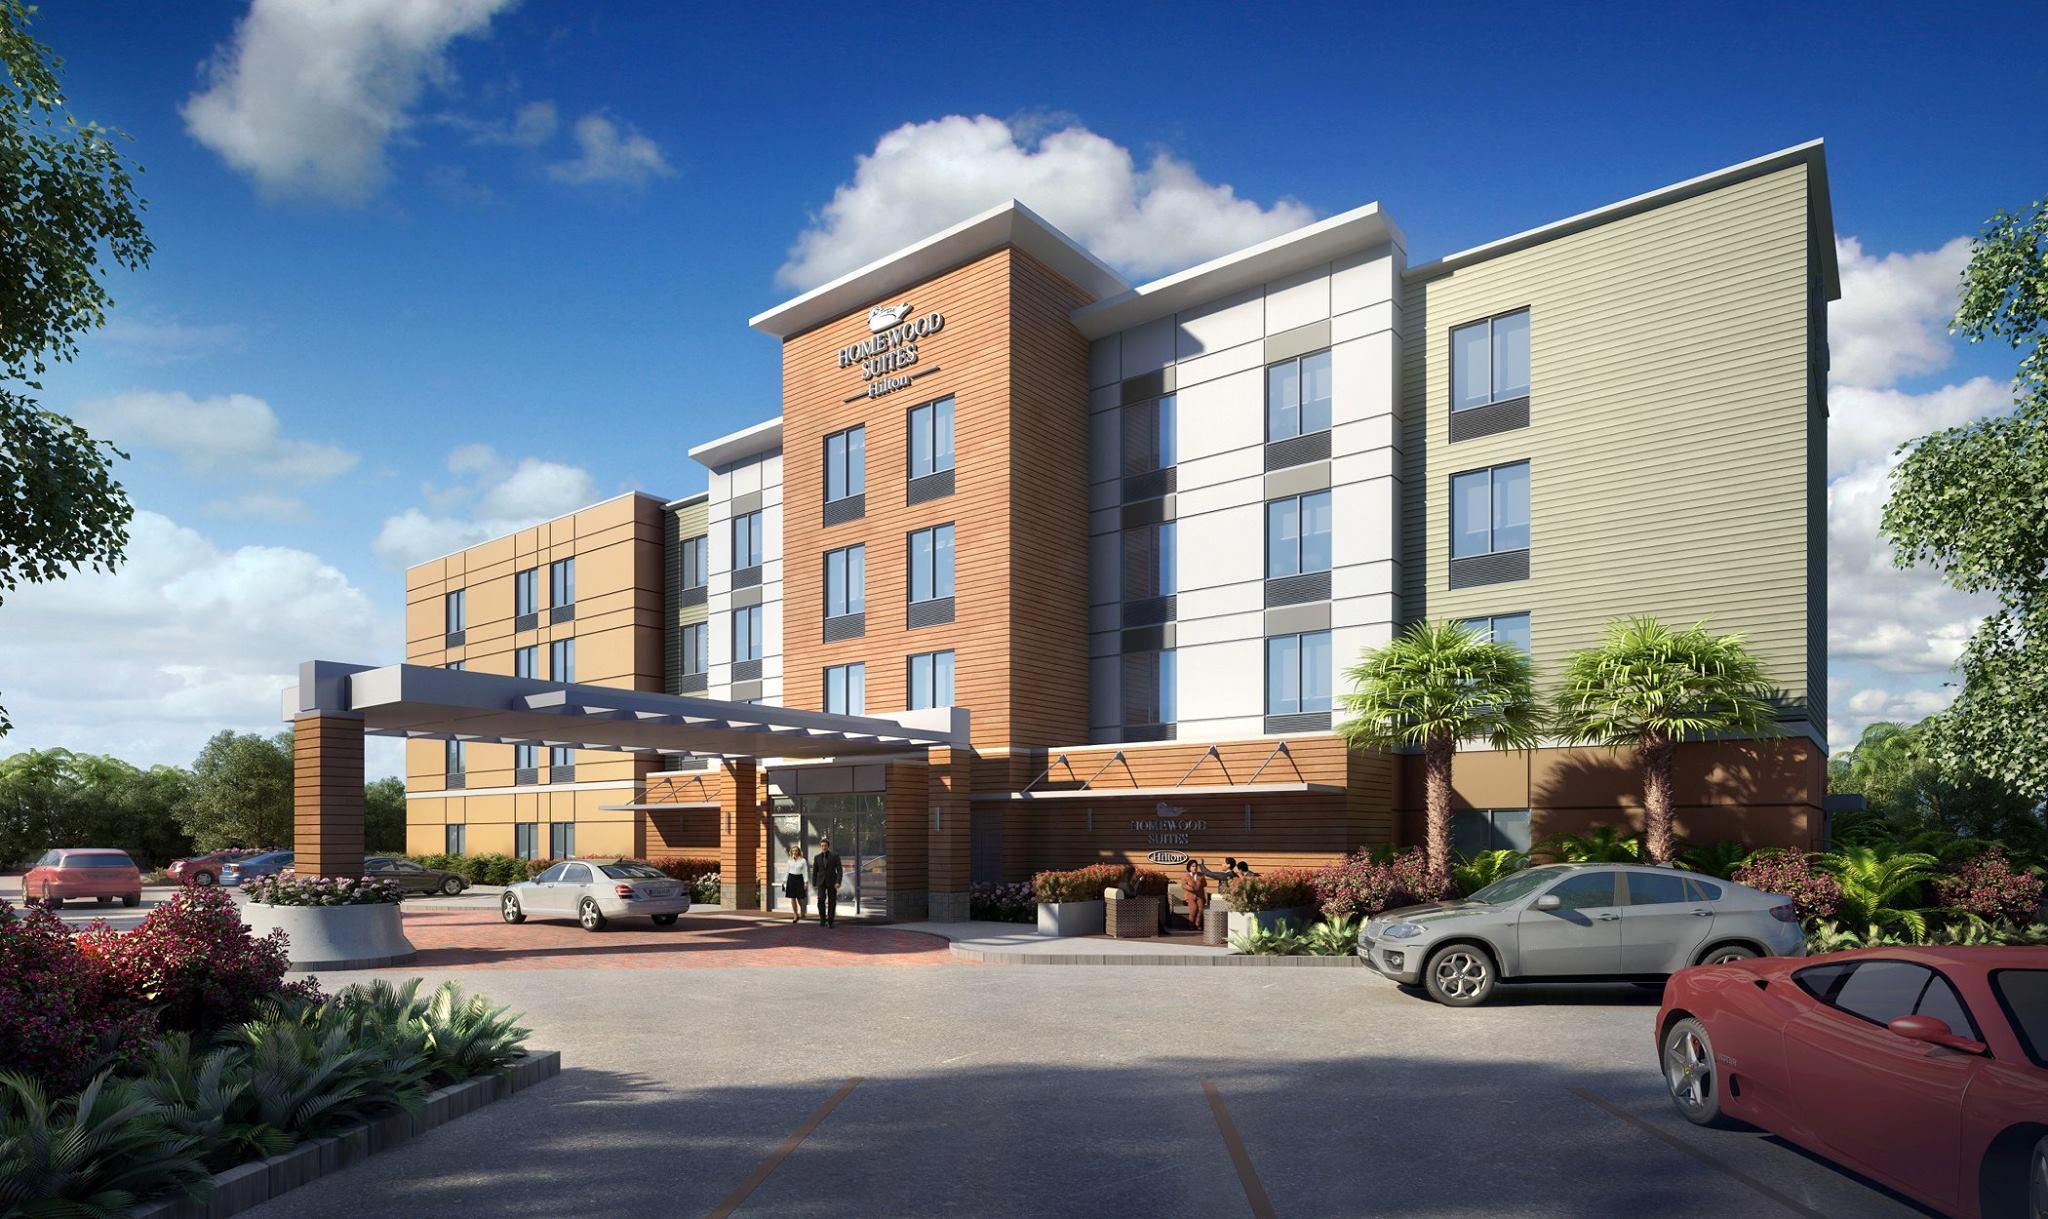 Homewood Suites by Hilton, Beltway